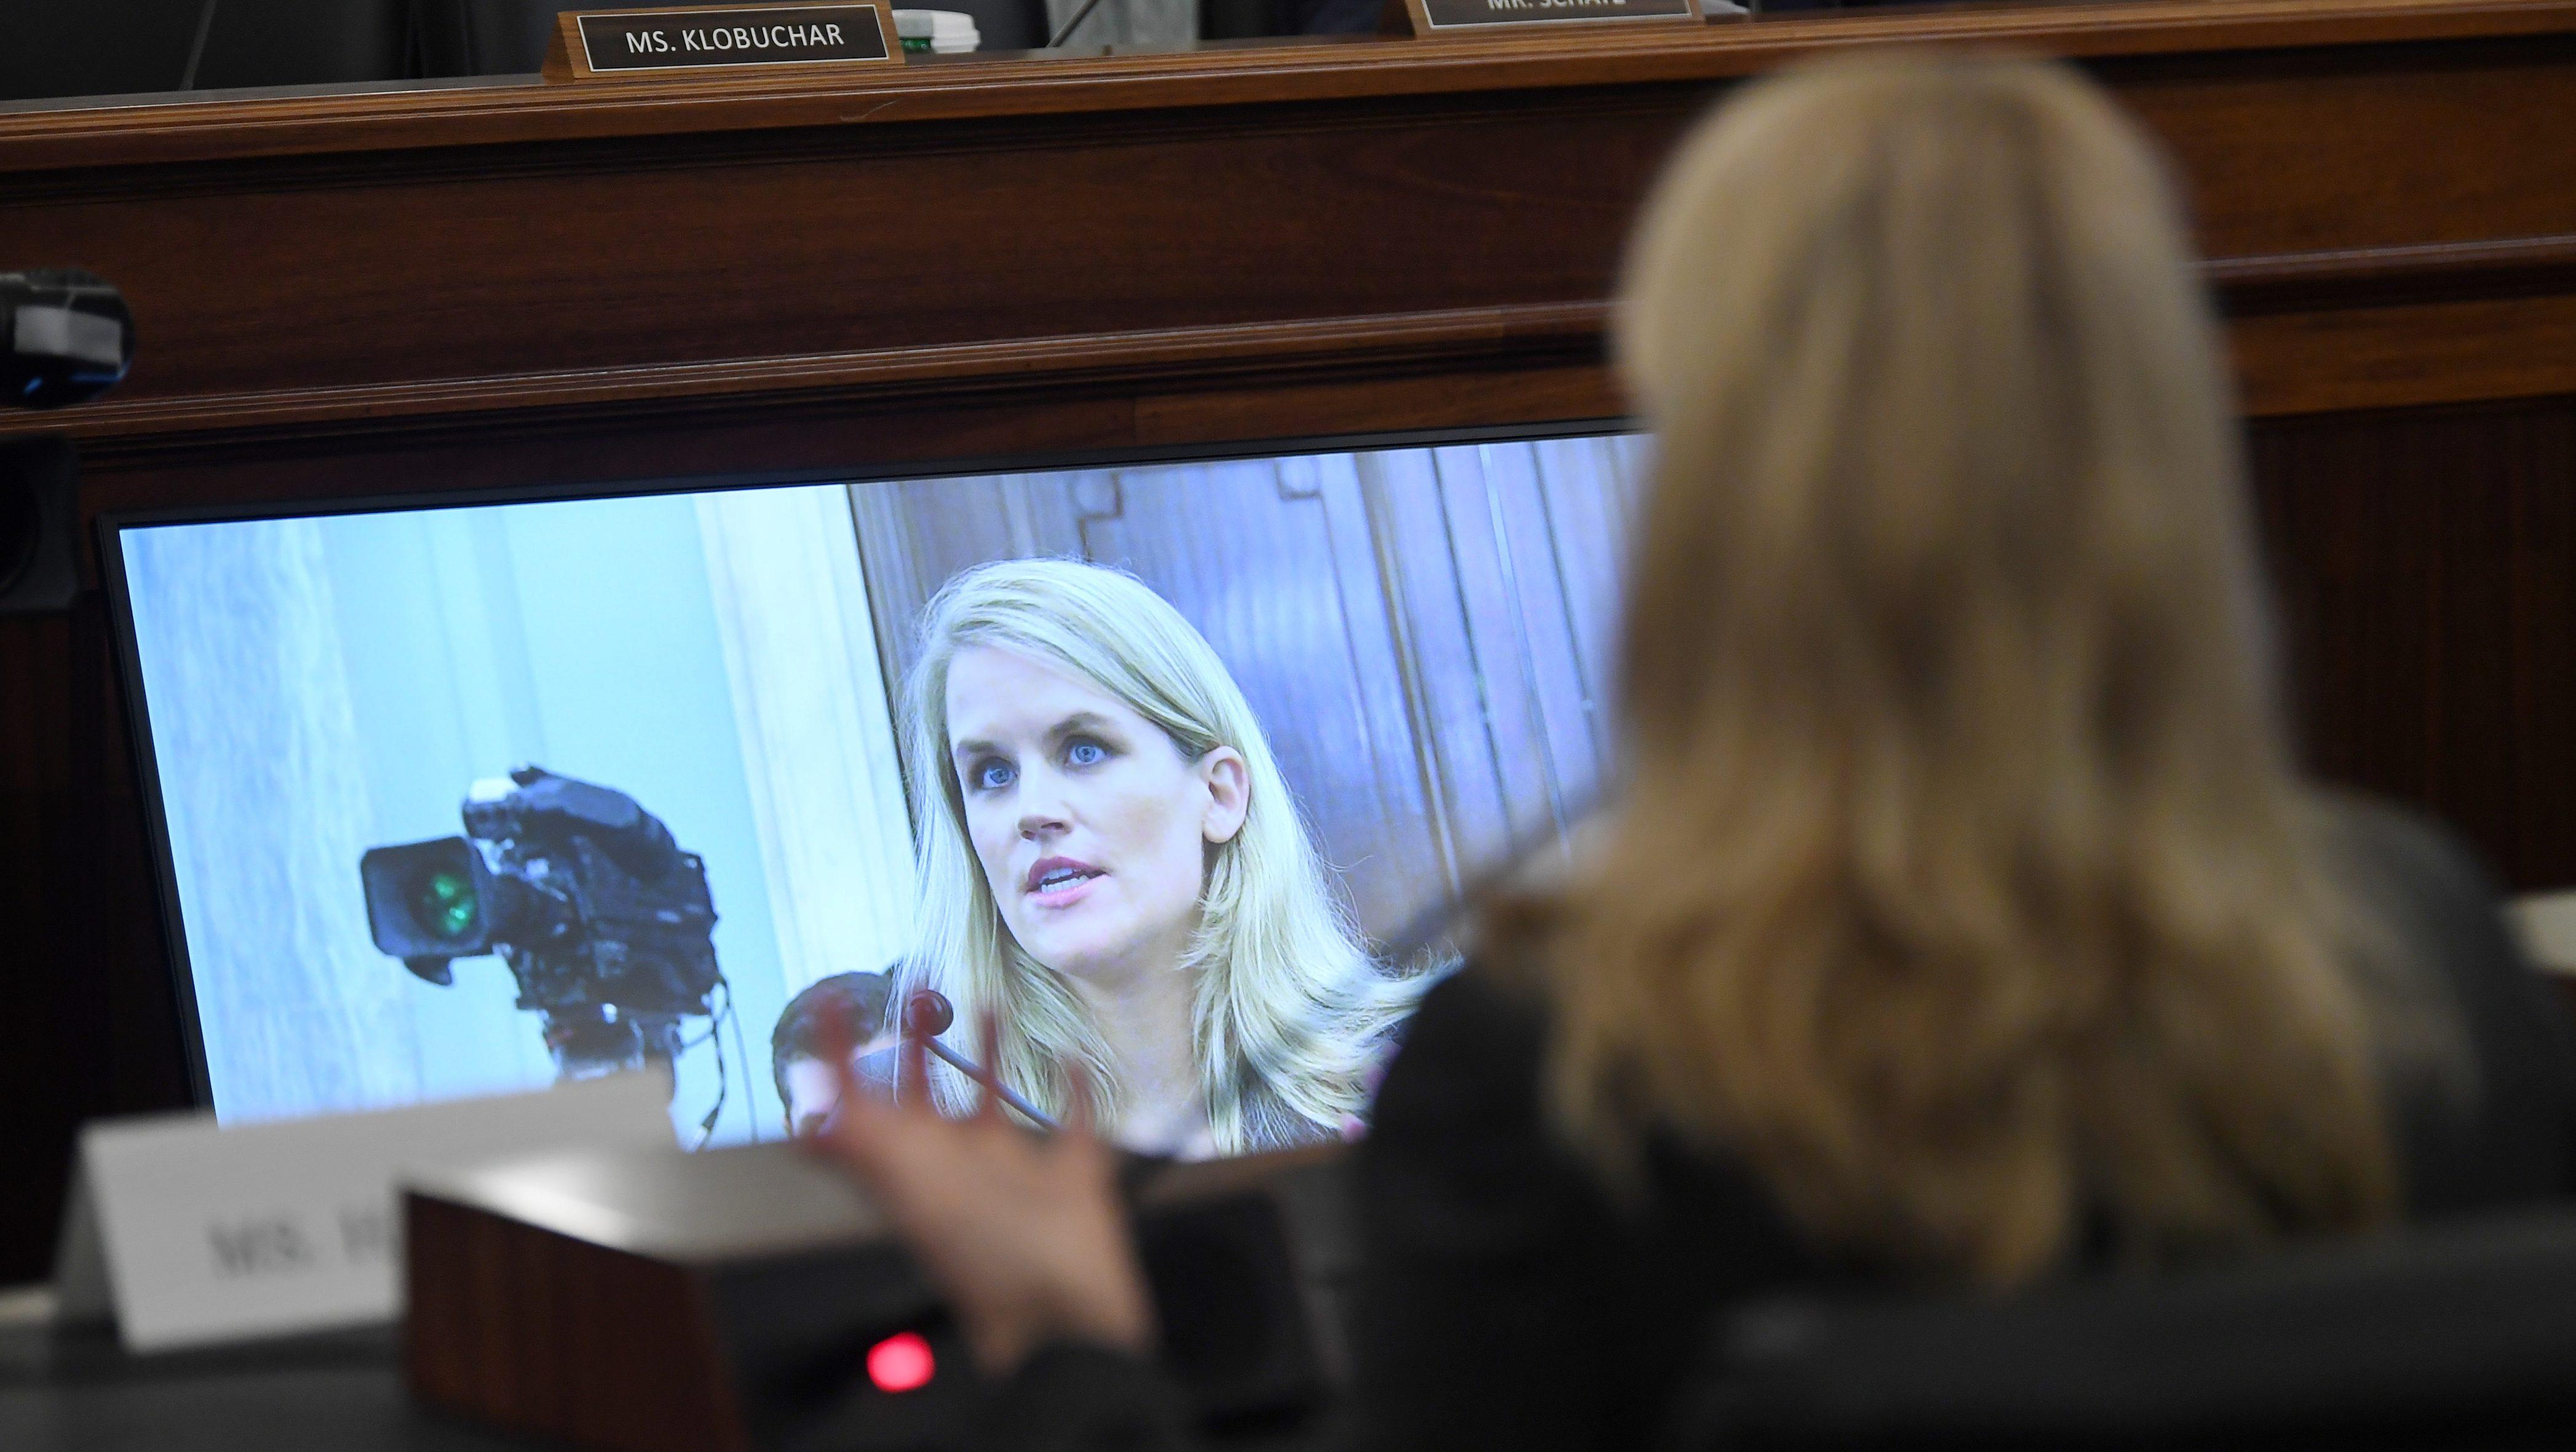 Former Facebook employee and whistleblower Frances Haugen testifies before the Senate.